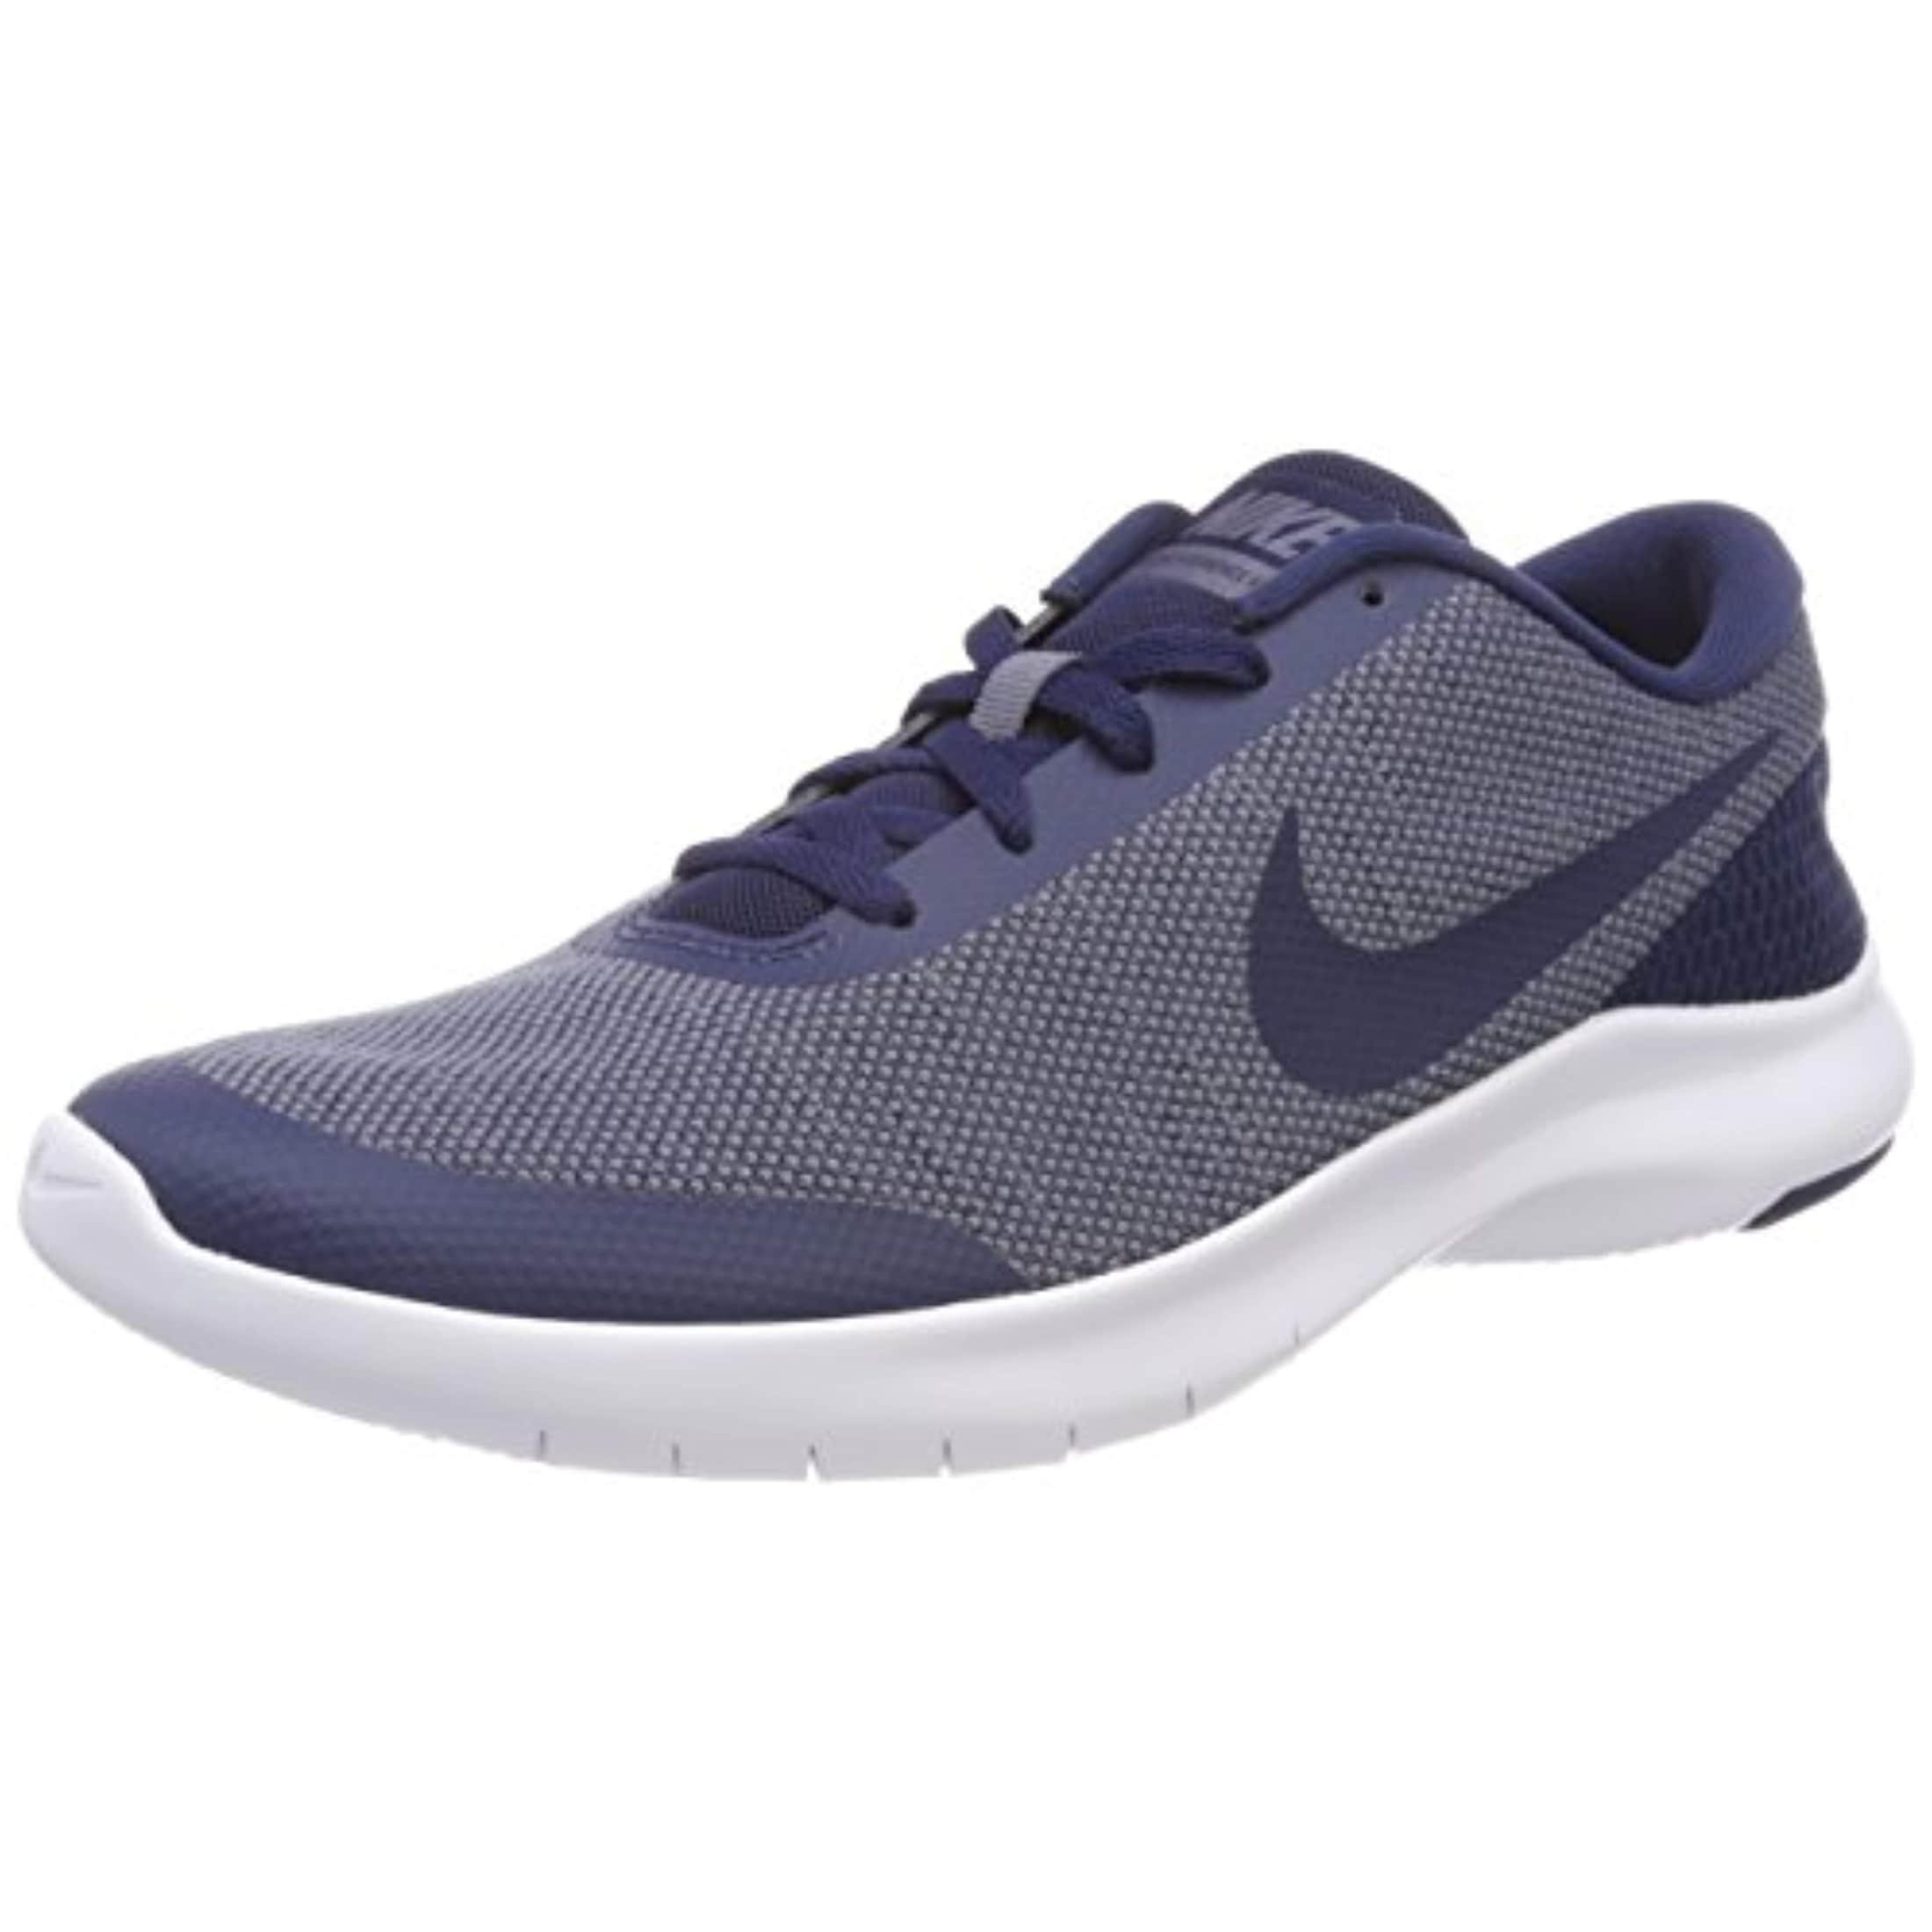 c2cb649fb3e2b6 Shop Nike Mens Flex Experience Rn 7 Midnight - Free Shipping Today -  Overstock - 27125509